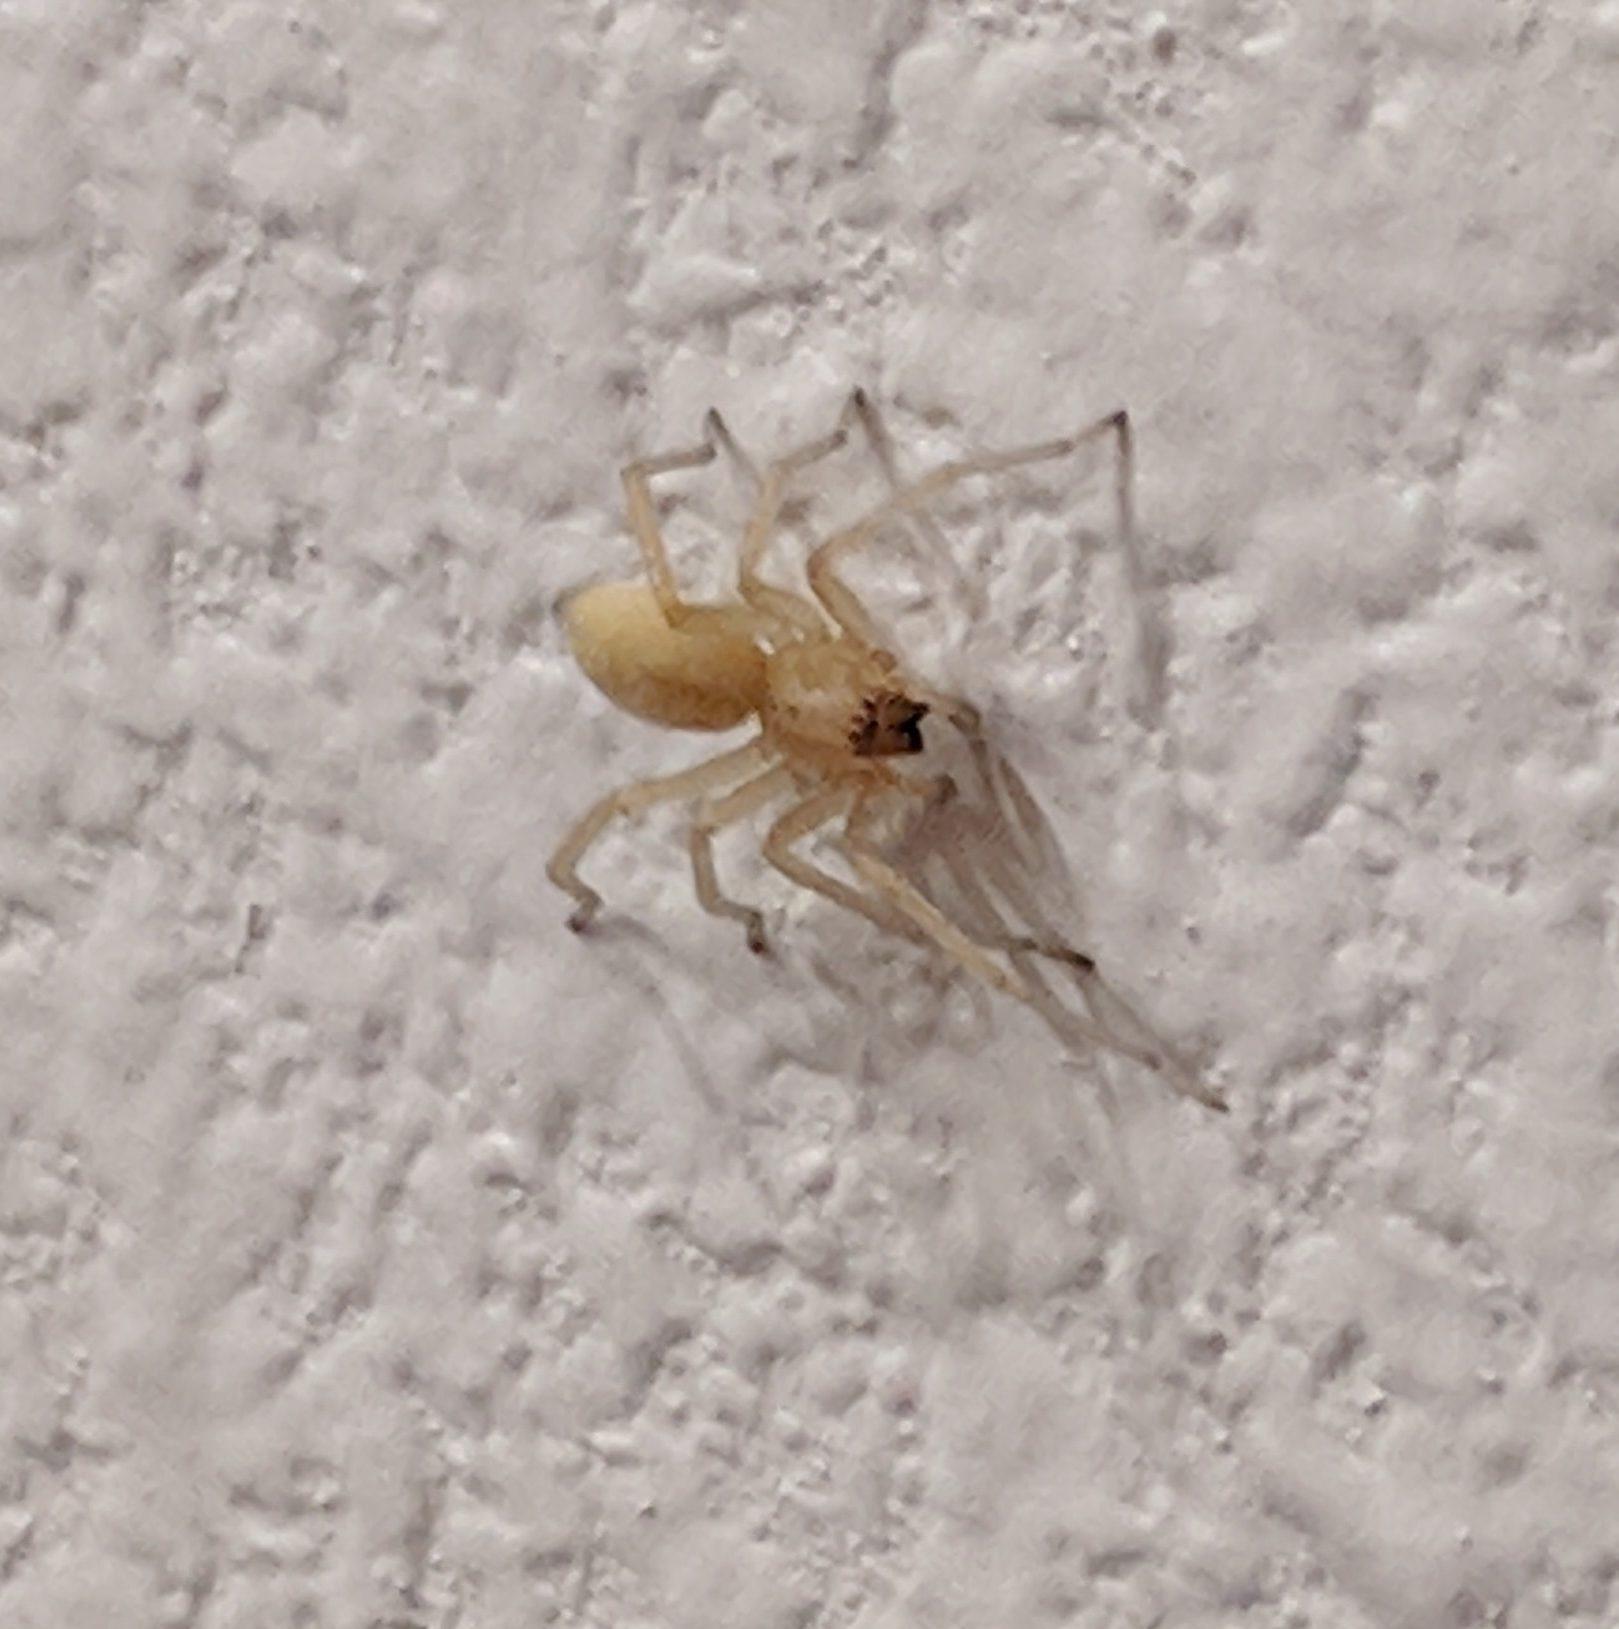 Picture of Cheiracanthium mildei (Long-legged Sac Spider) - Dorsal